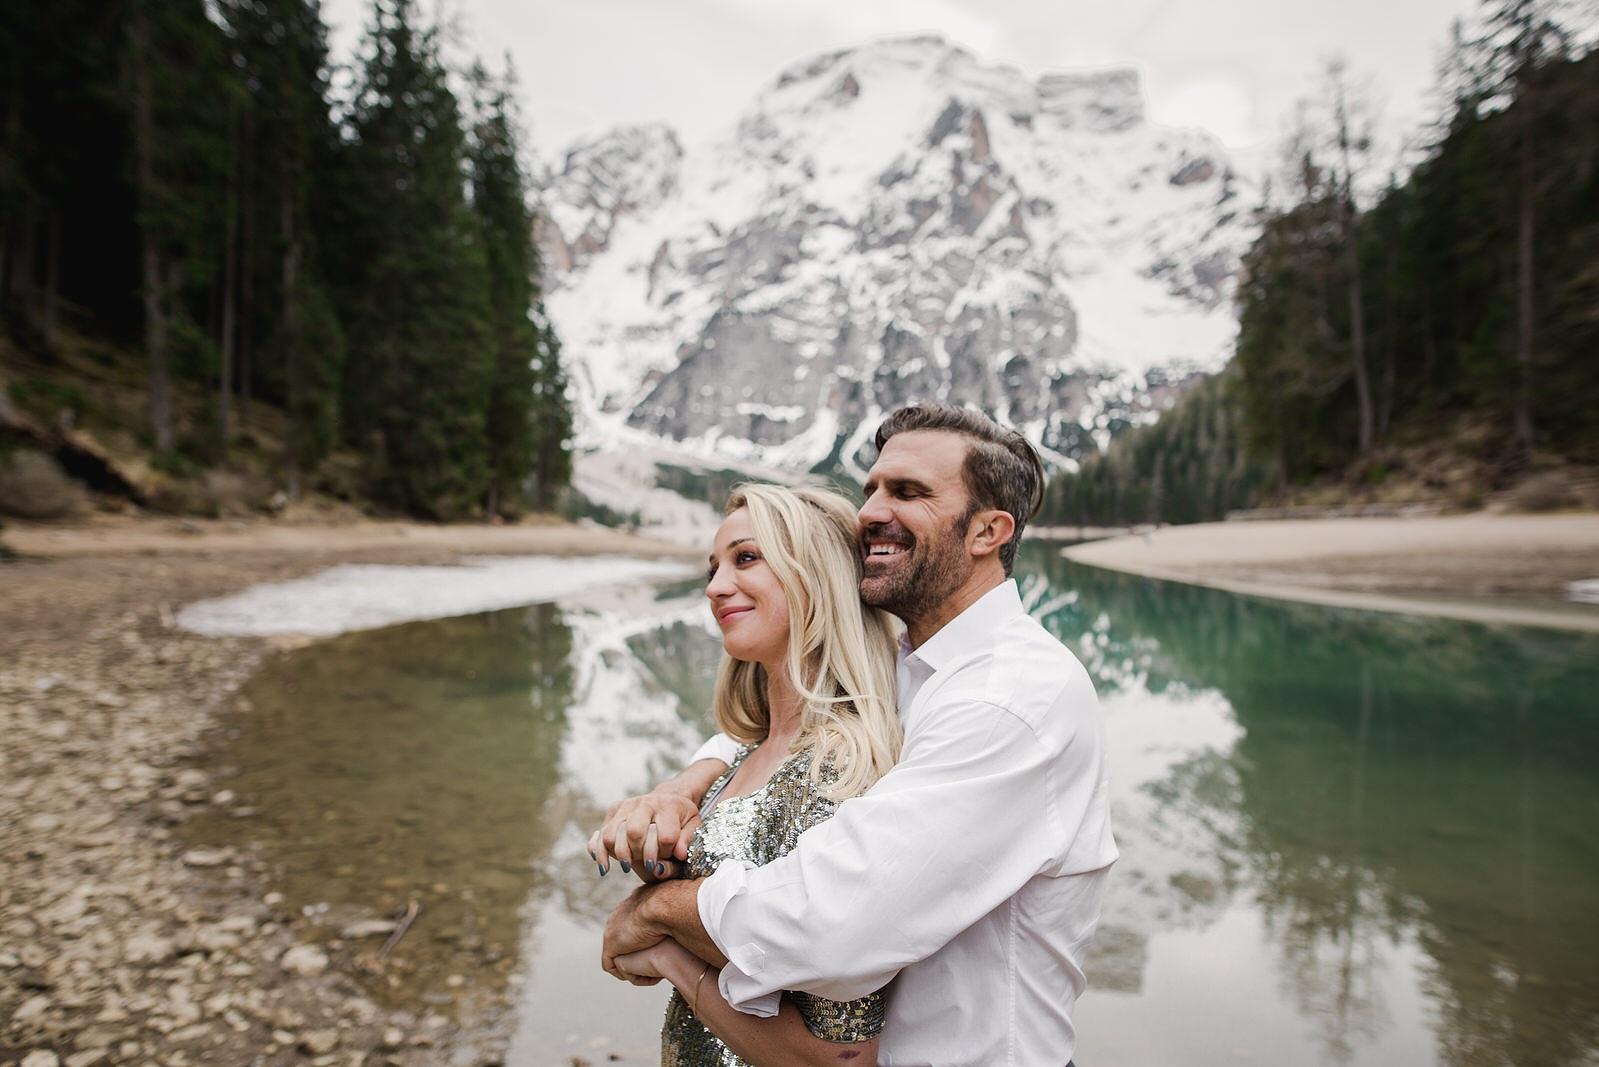 Fotomagoria+Dolomites+Lago+di+Braies+Photographer+20.jpg